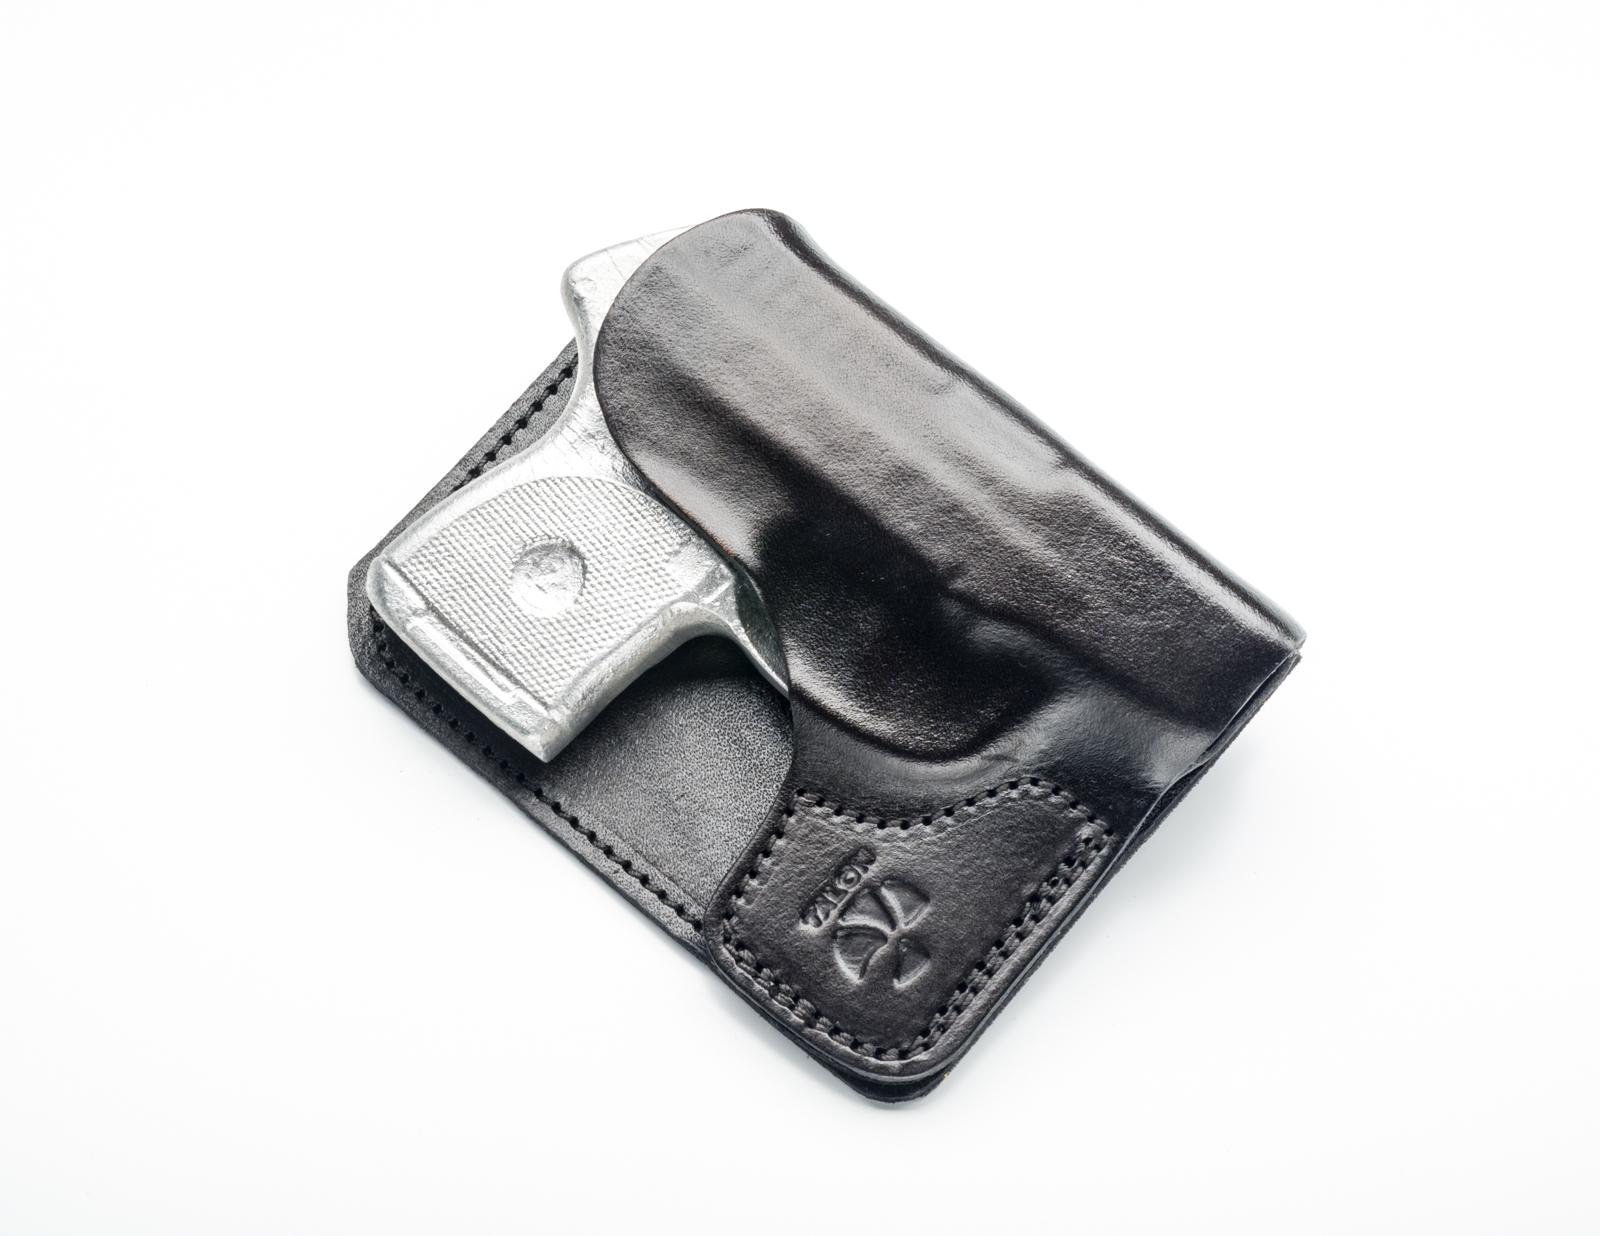 wallet pocket holster lcp